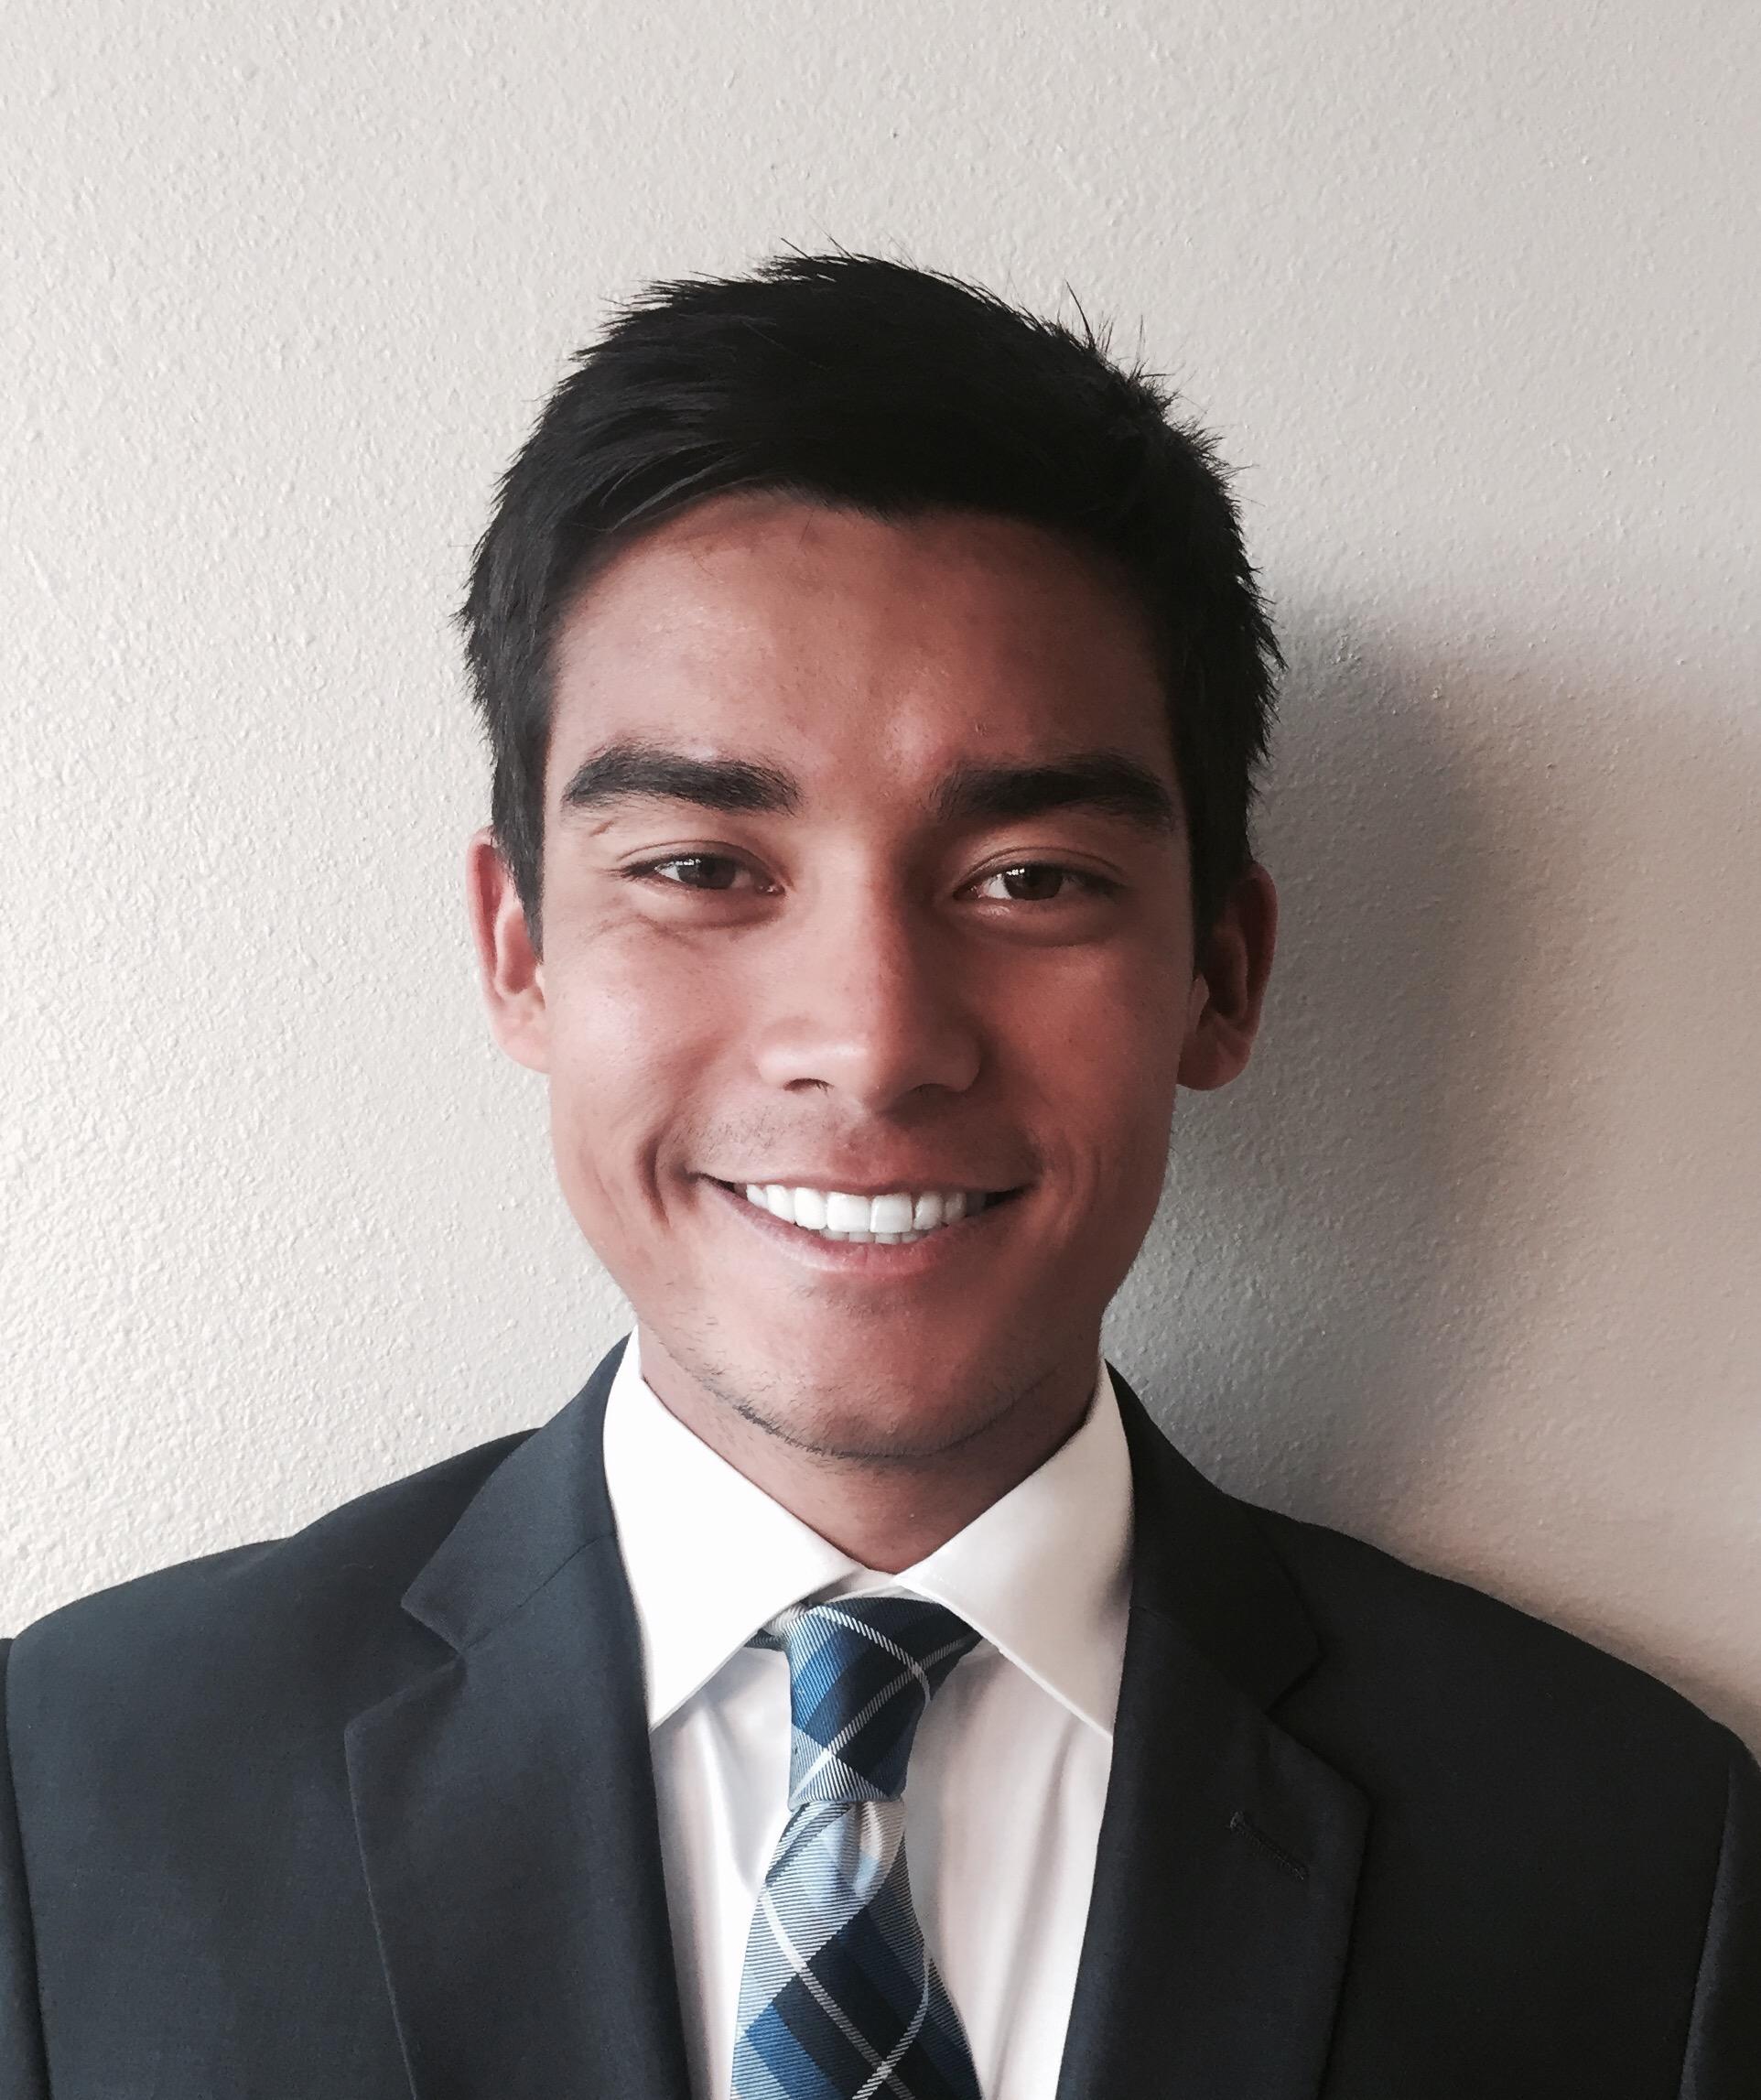 Brandon Kim - Year in medical school: third yearHometown: Hartland, WIHigh School: Arrowhead High SchoolHCF role: Website Manager